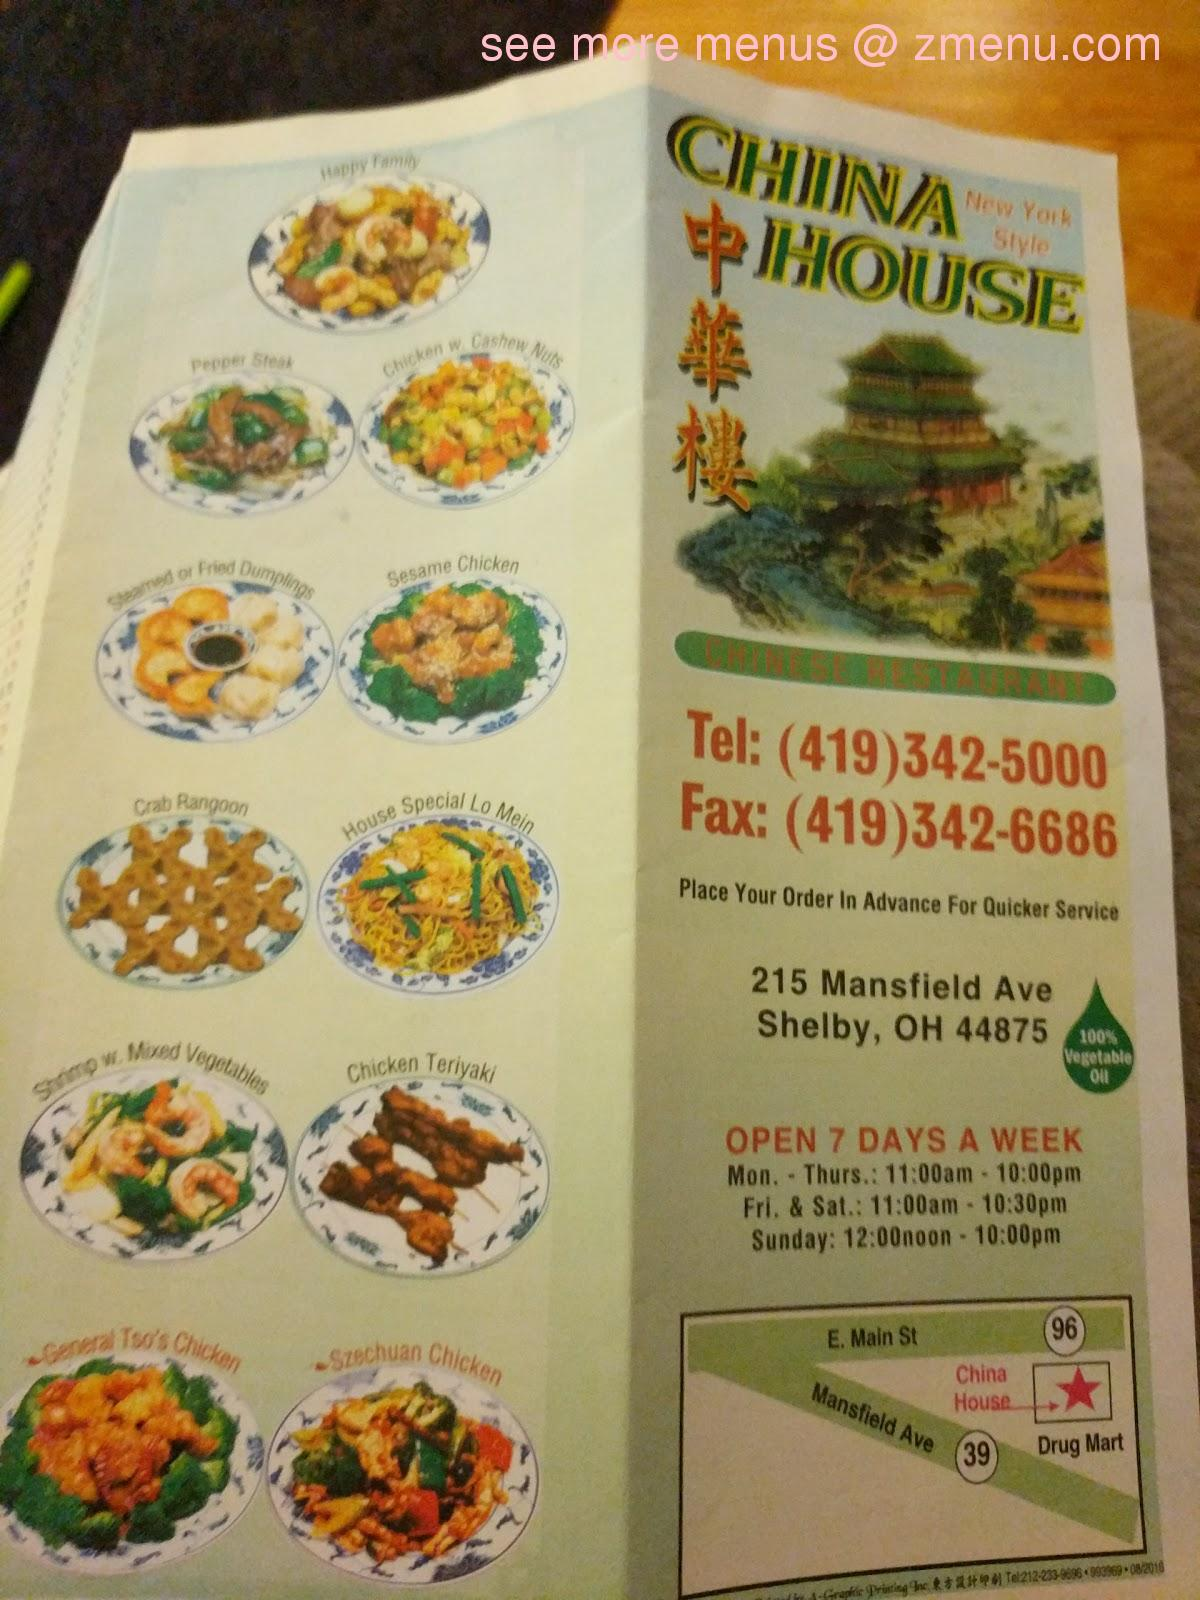 online menu of china house restaurant shelby ohio 44875